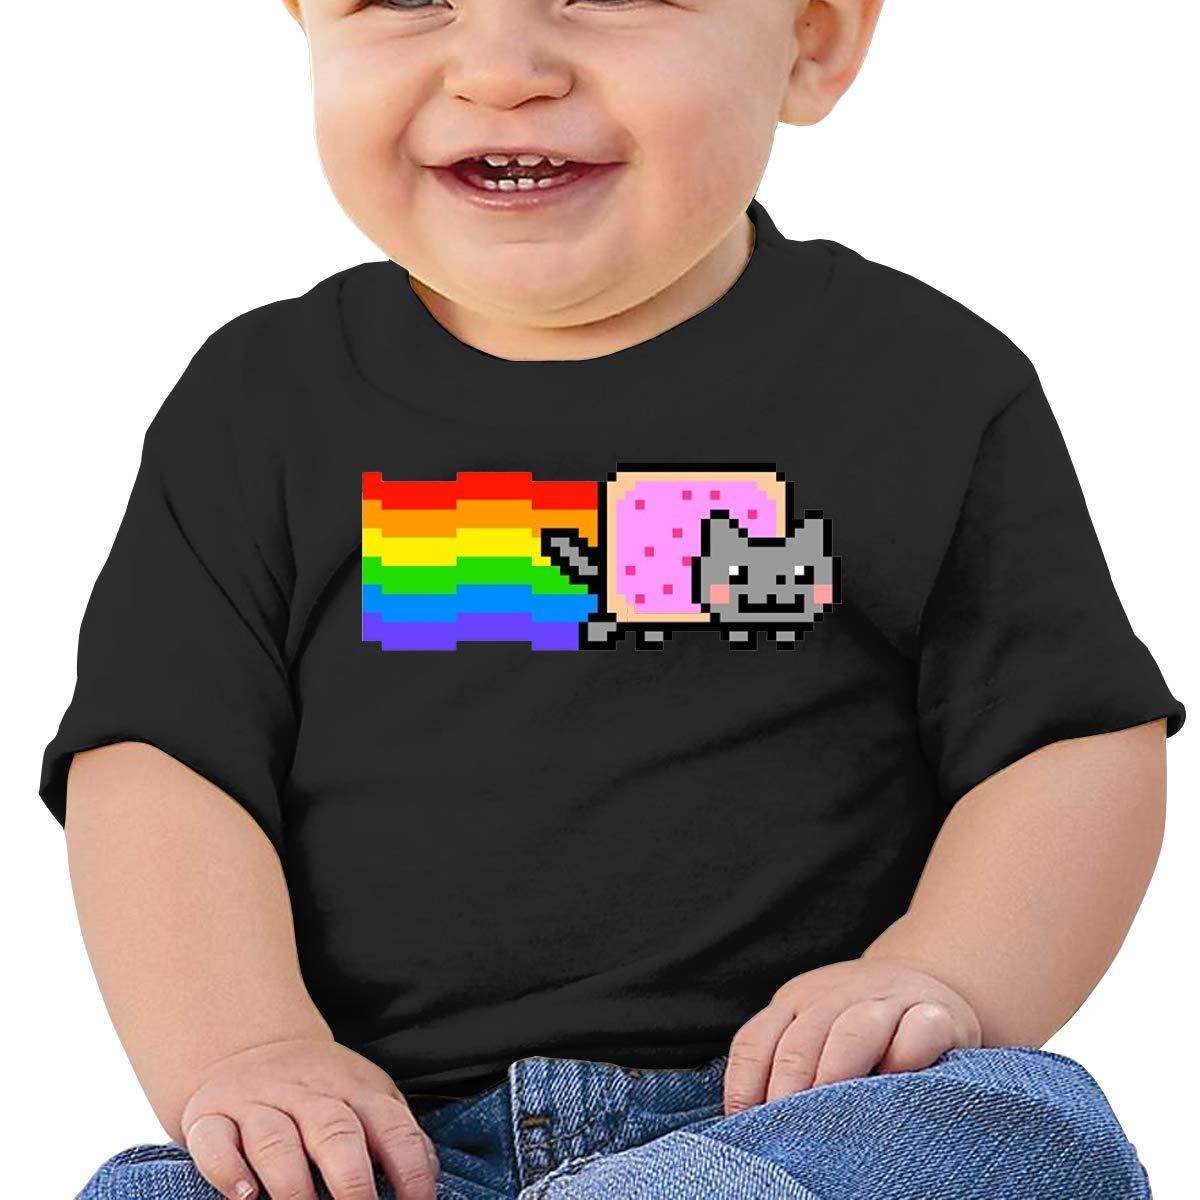 8-bits Pixel Nyan Cat Toddler Short-Sleeve Tee for Boy Girl Infant Kids T-Shirt On Newborn 6-18 Months